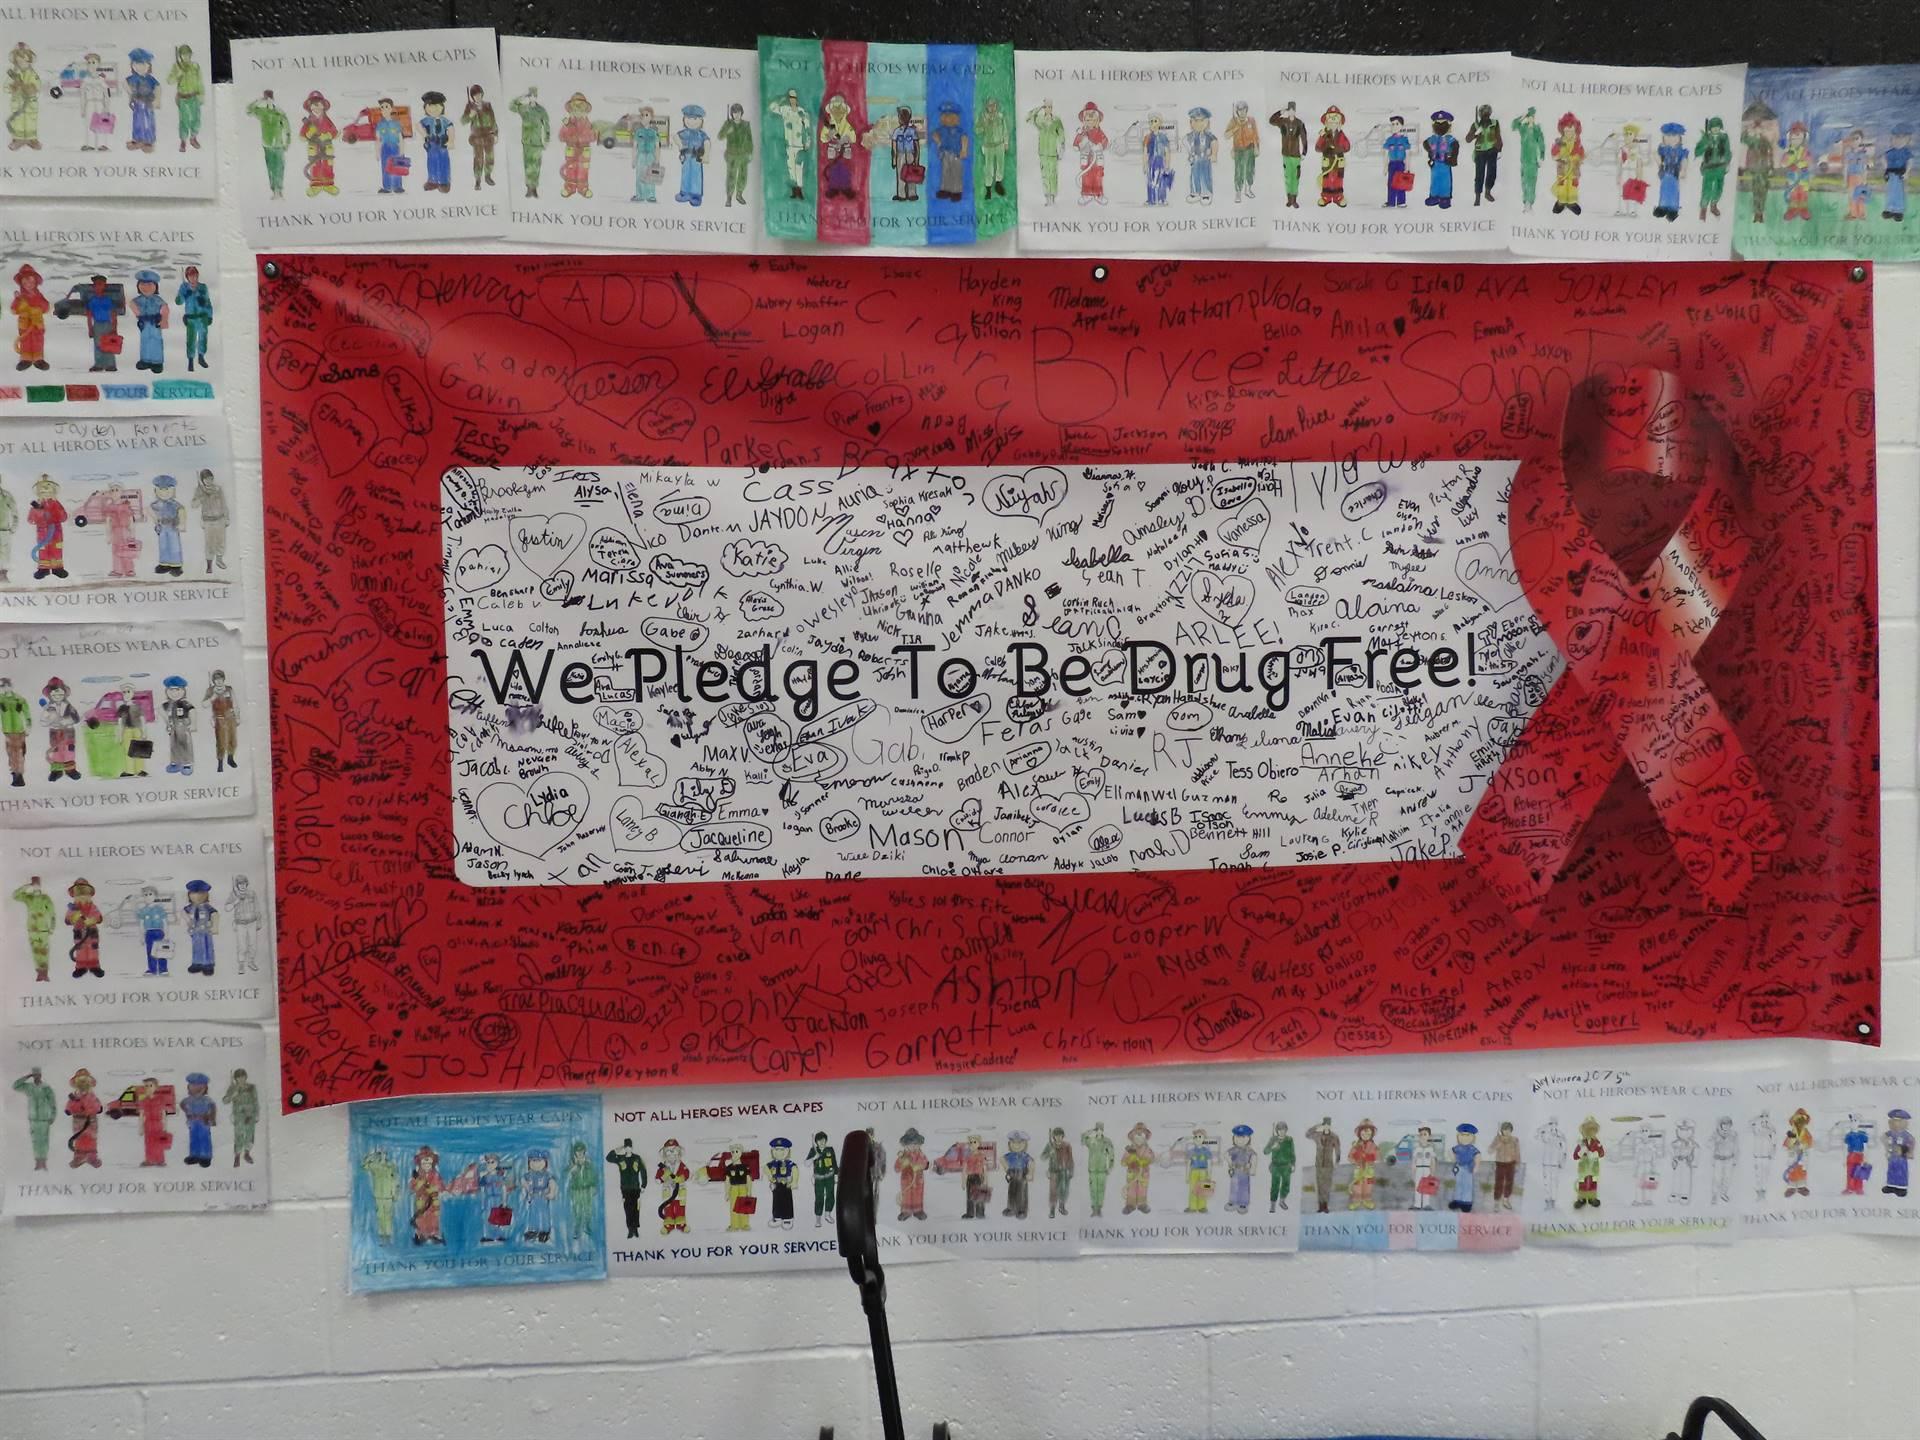 Drug-free poster